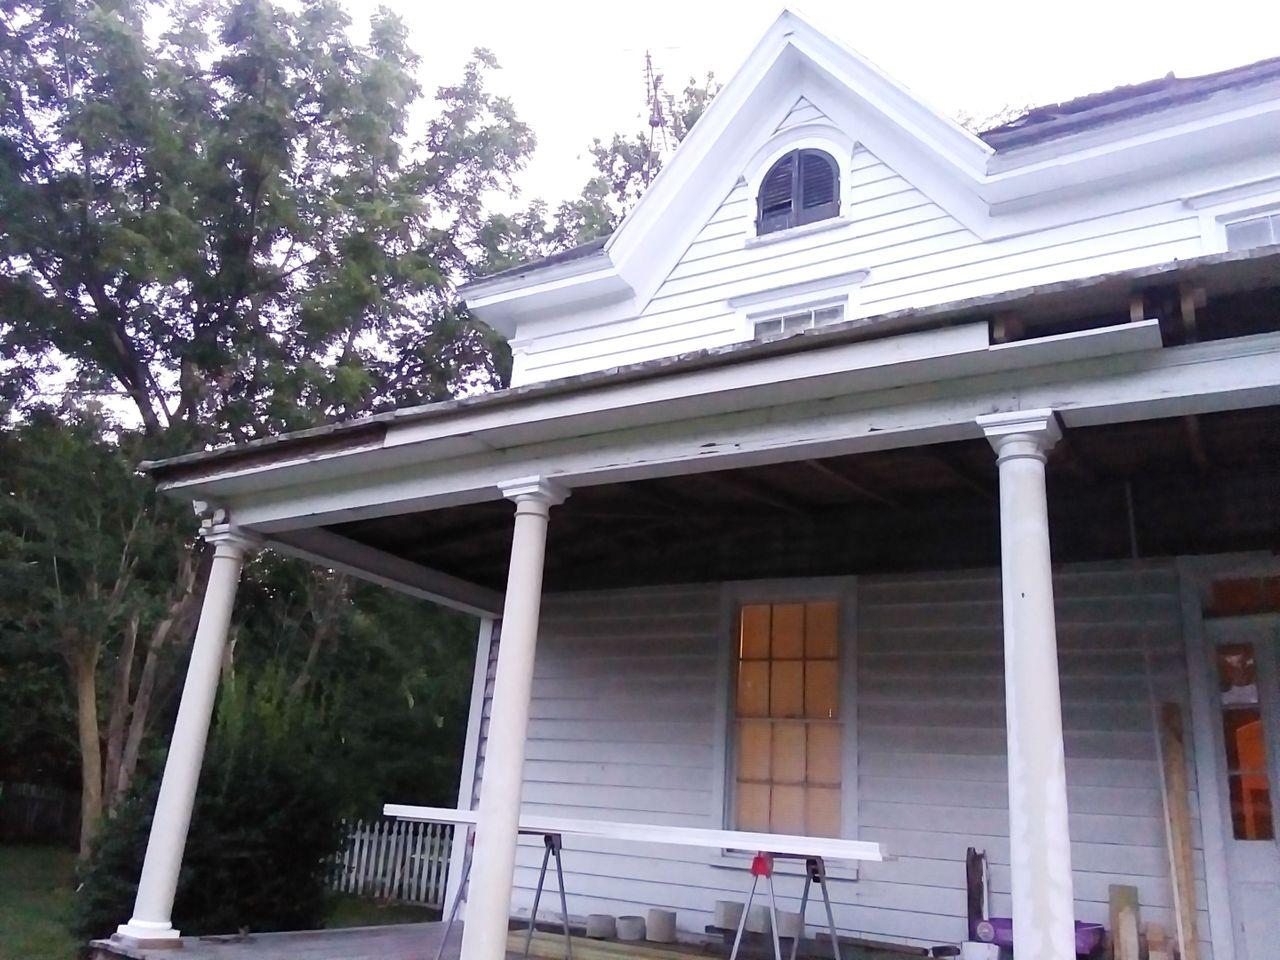 20210825_194644_HDR roof.jpg